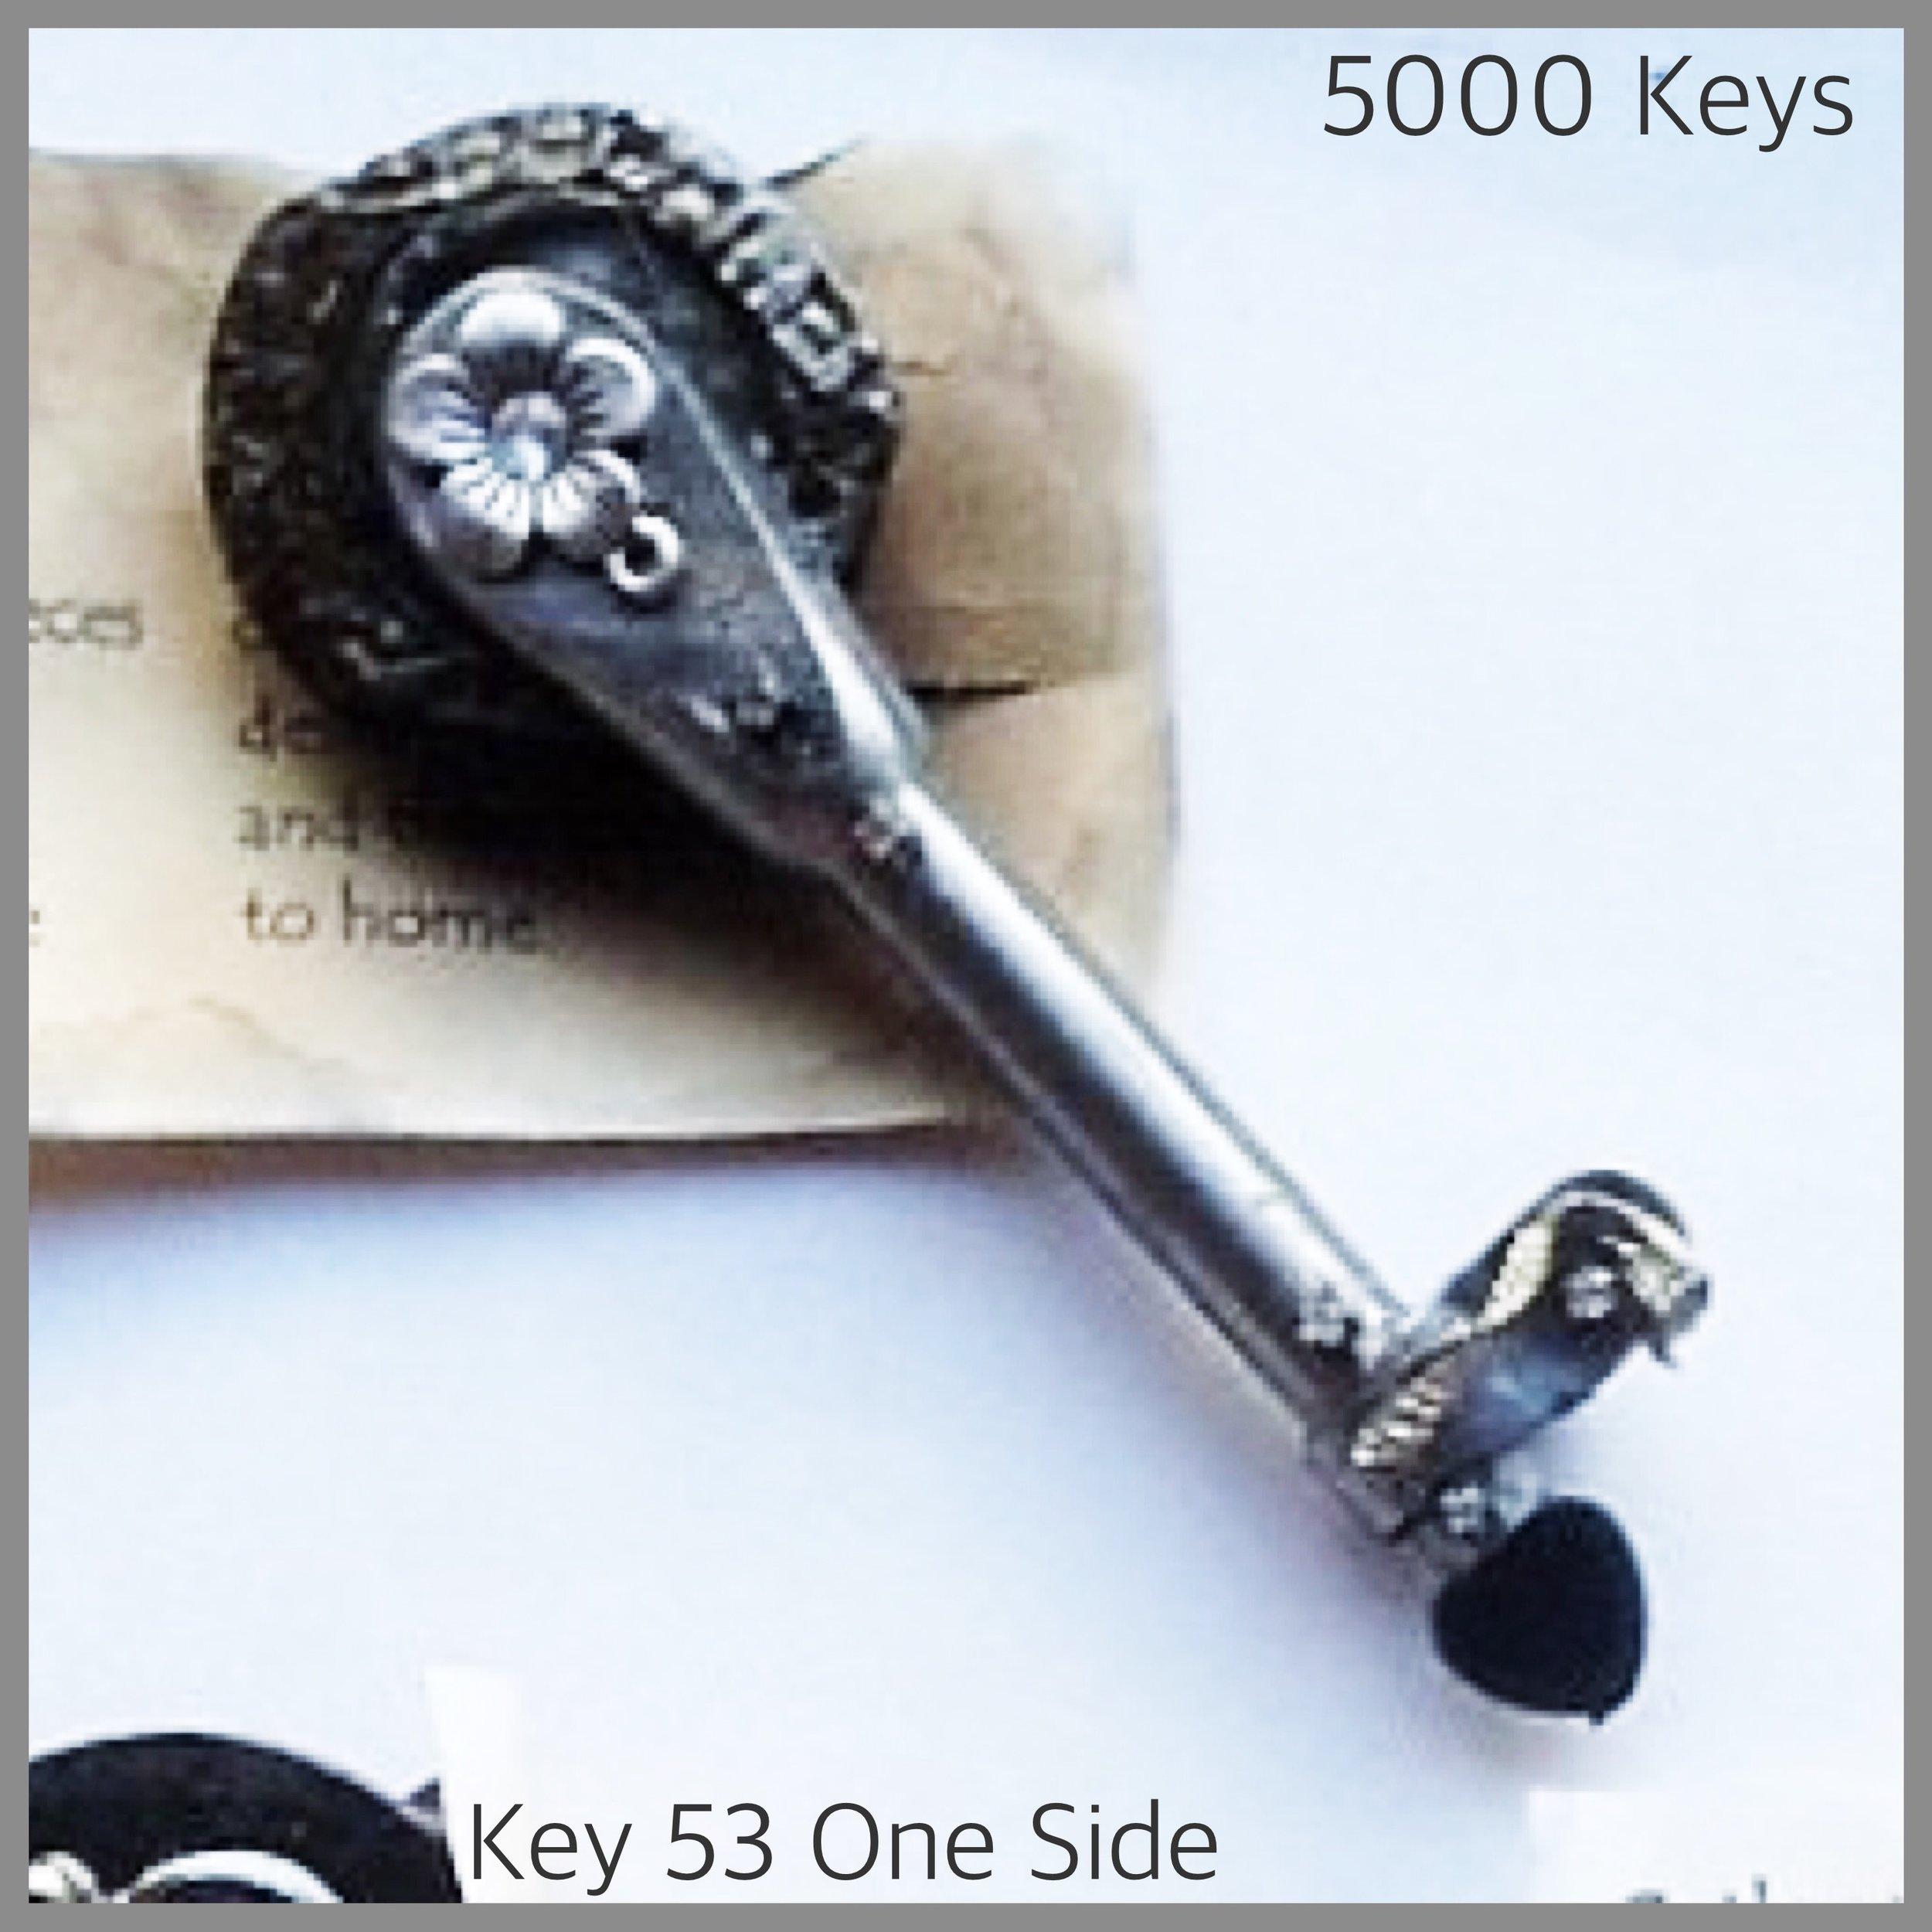 Key 53 one side - 1.JPG